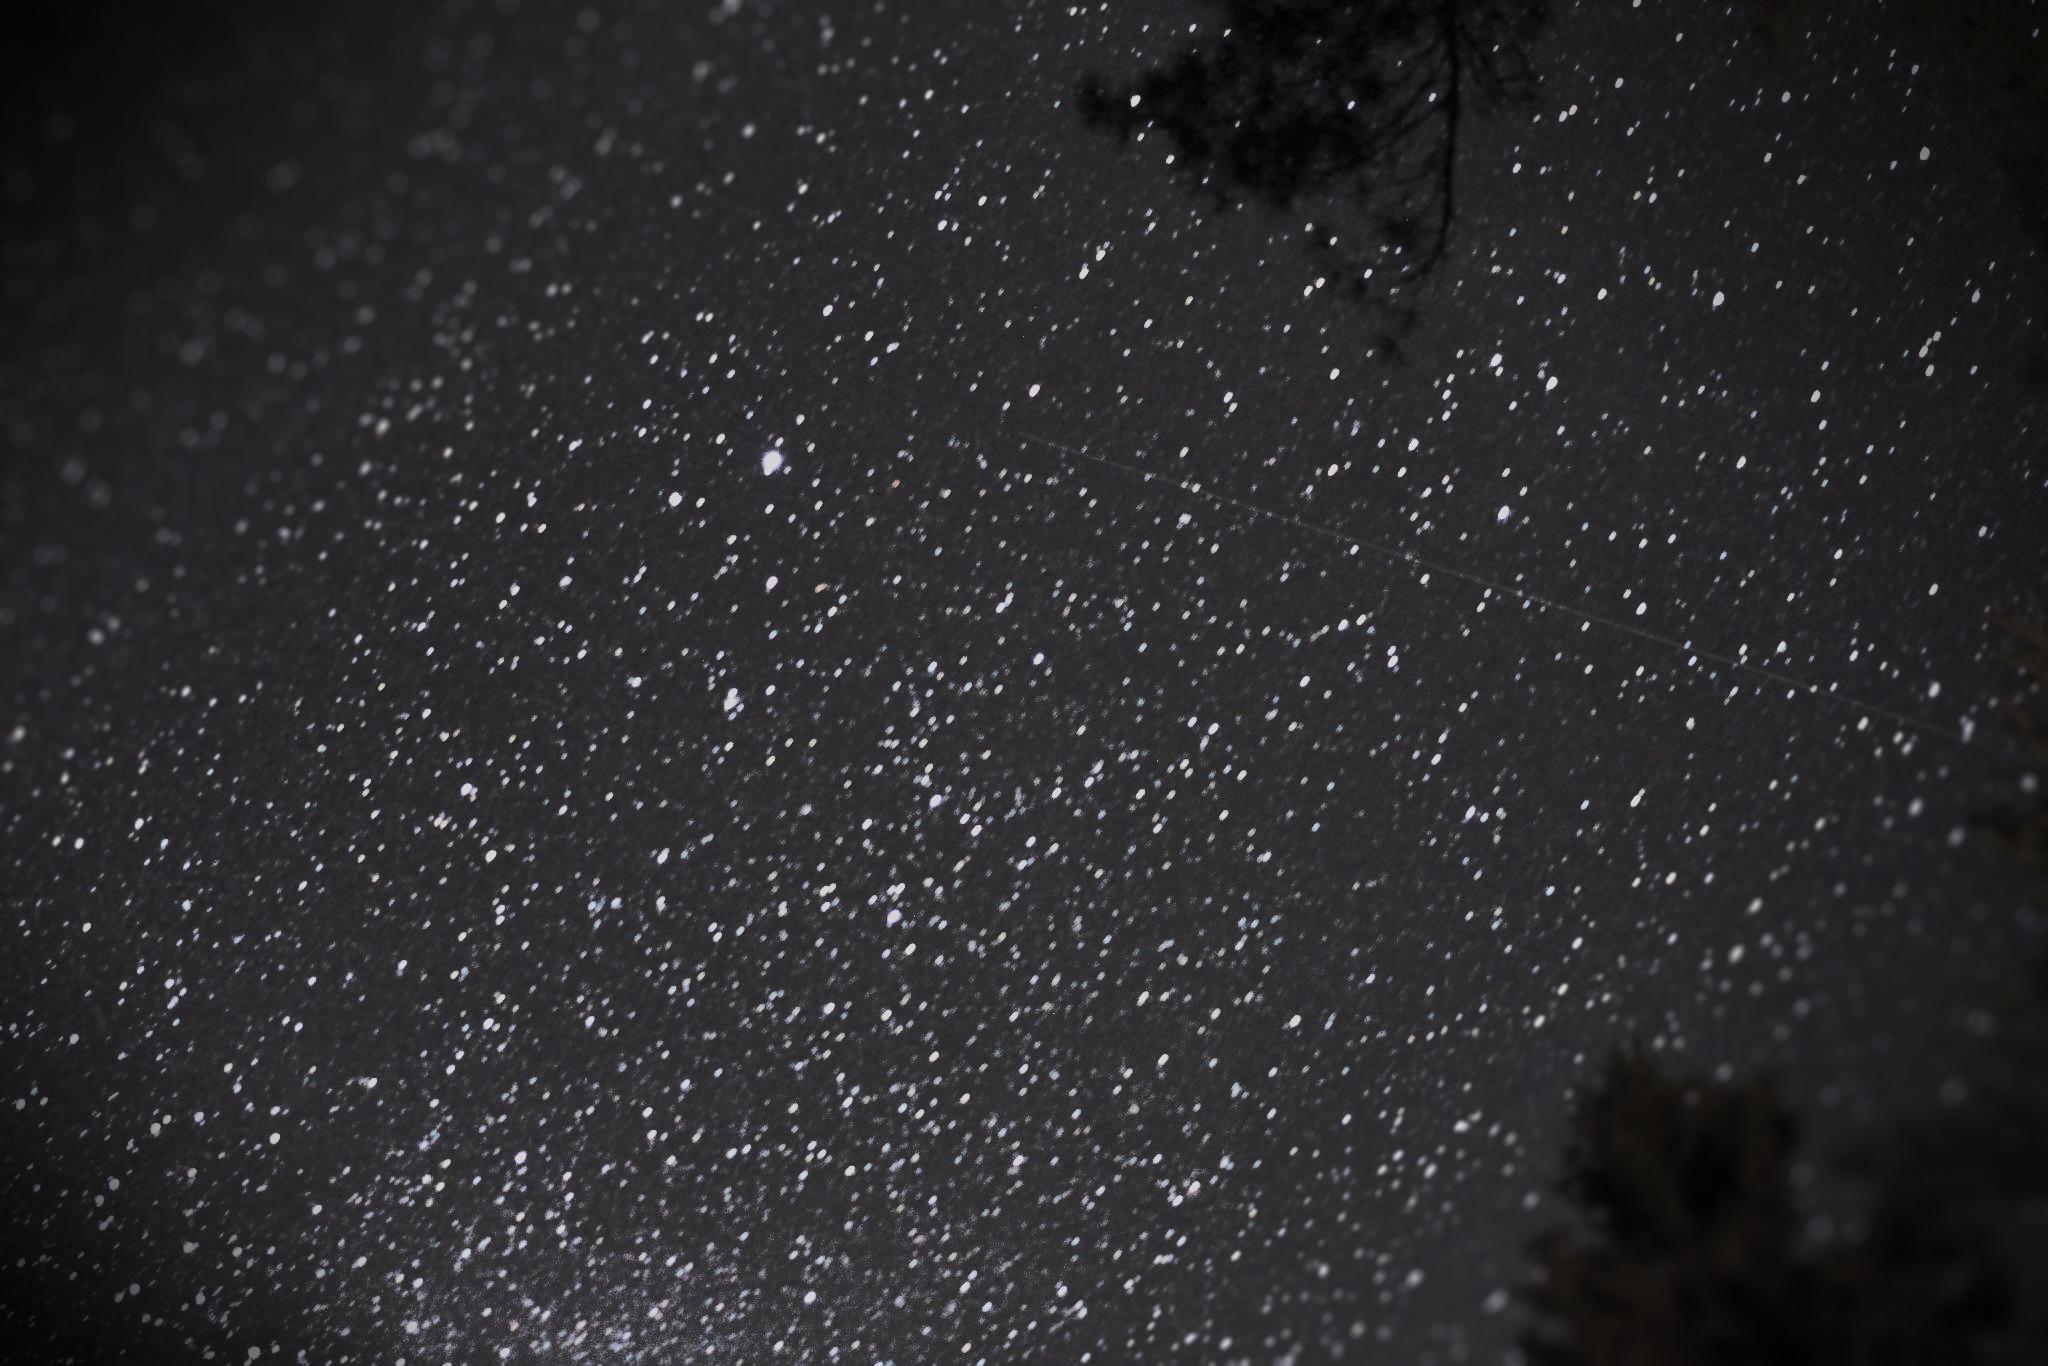 The Stars.jpg